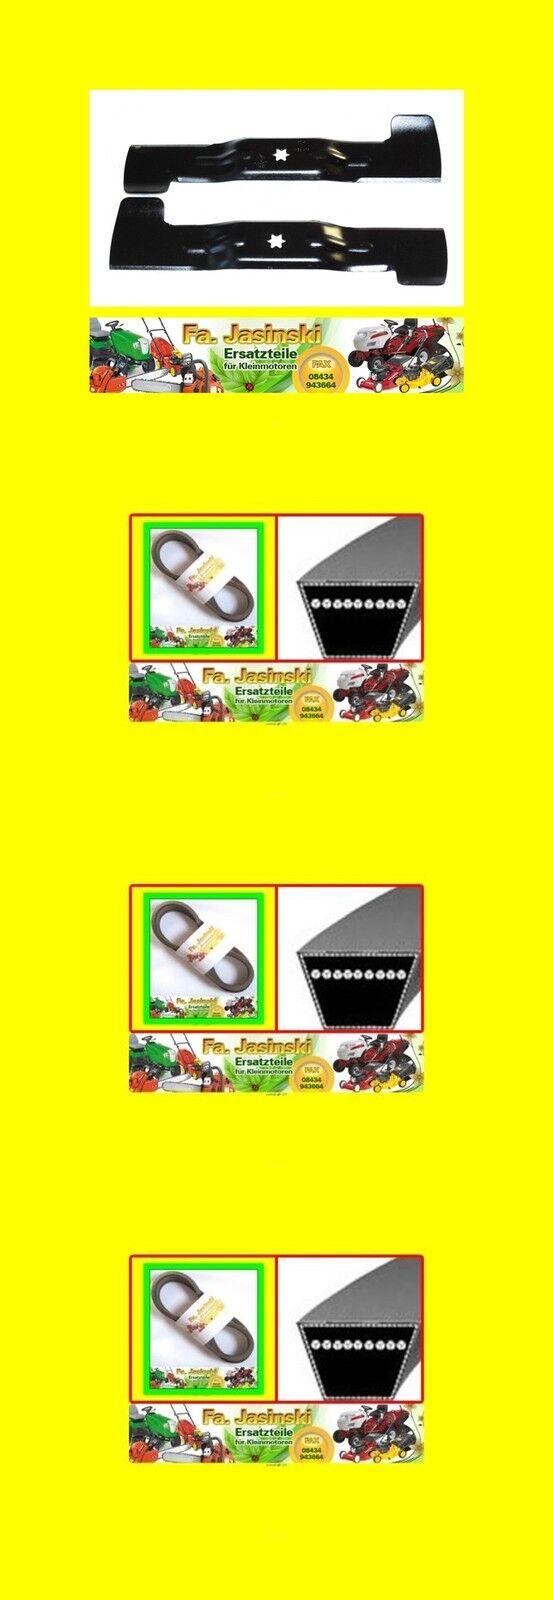 Set coltelli per GUTBROD & gtglx 92 ra&gt13ca506e690 (2004) & gt3 cinghie trapezoidali